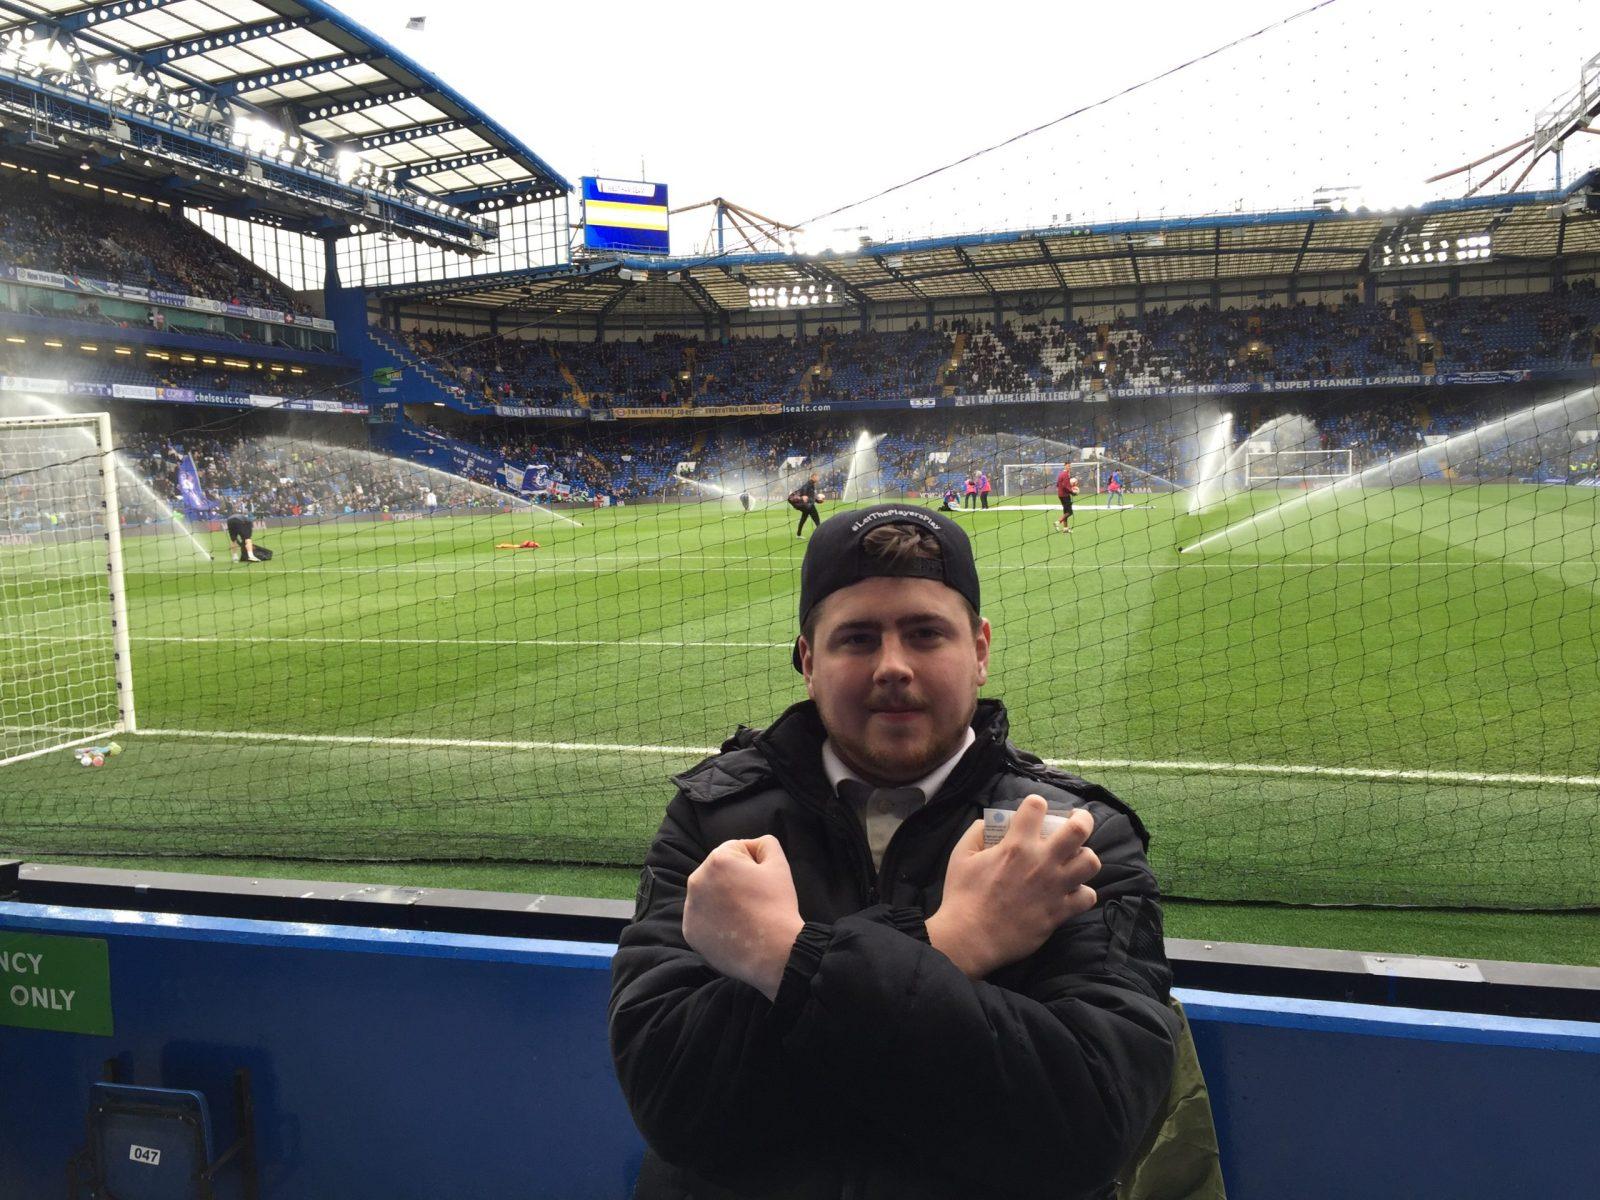 Chelsea v West Ham 19-03-2016